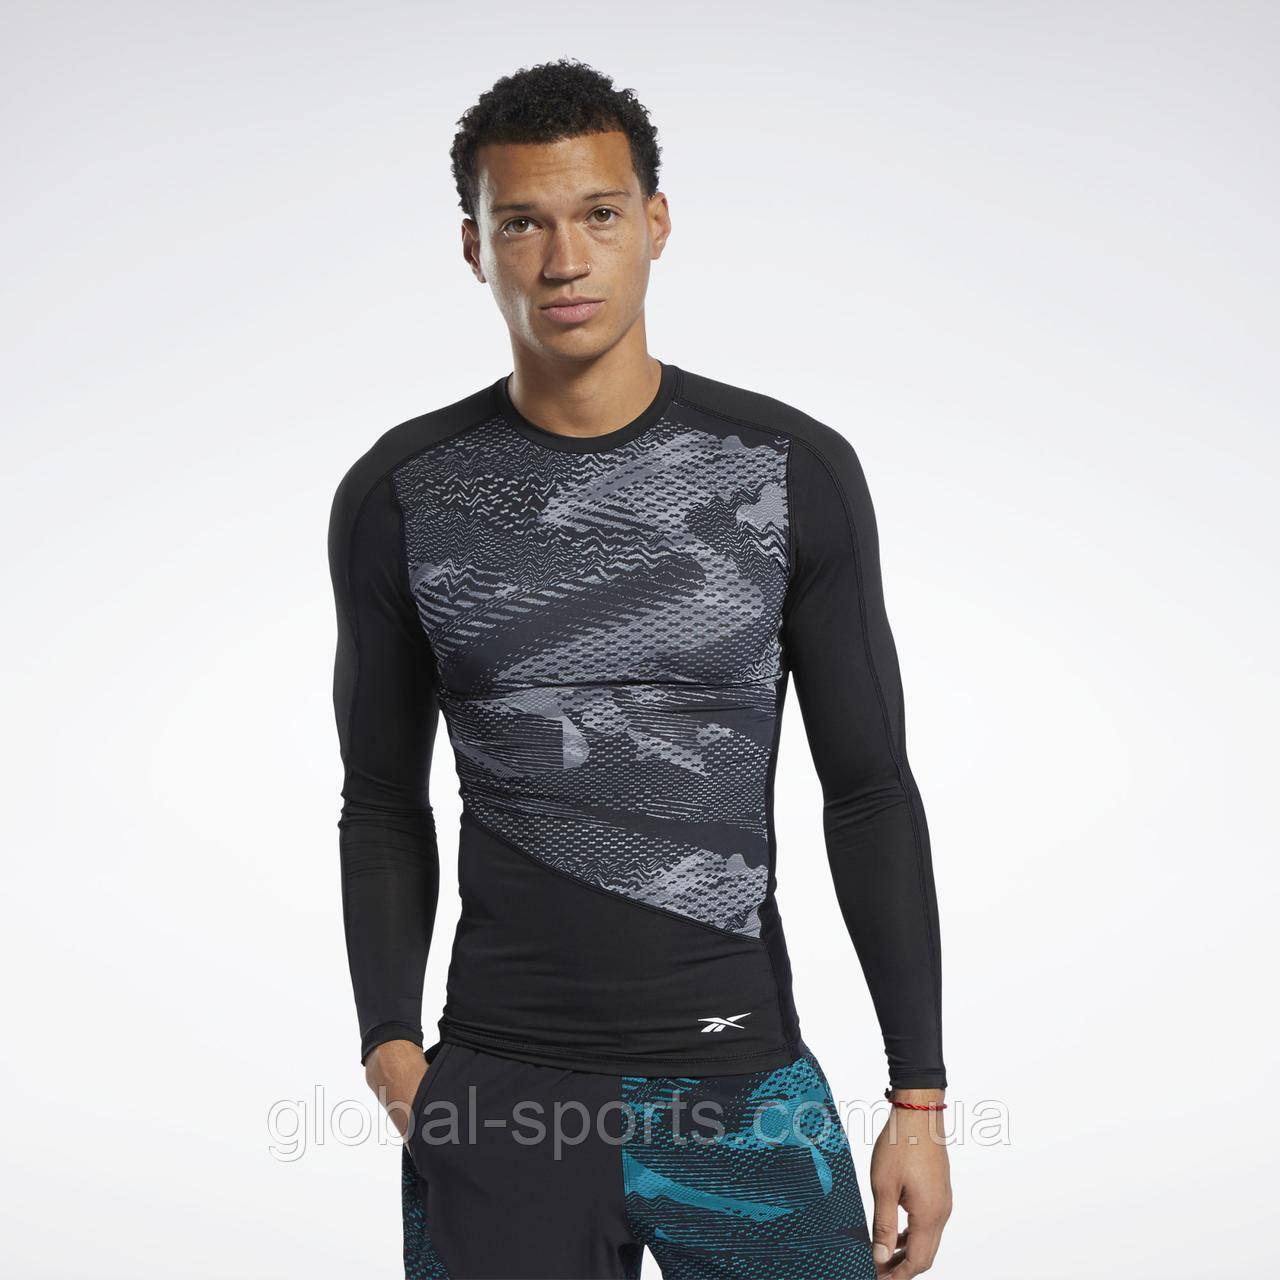 Мужская компрессионная футболка Reebok Graphic (Артикул: FJ4591)